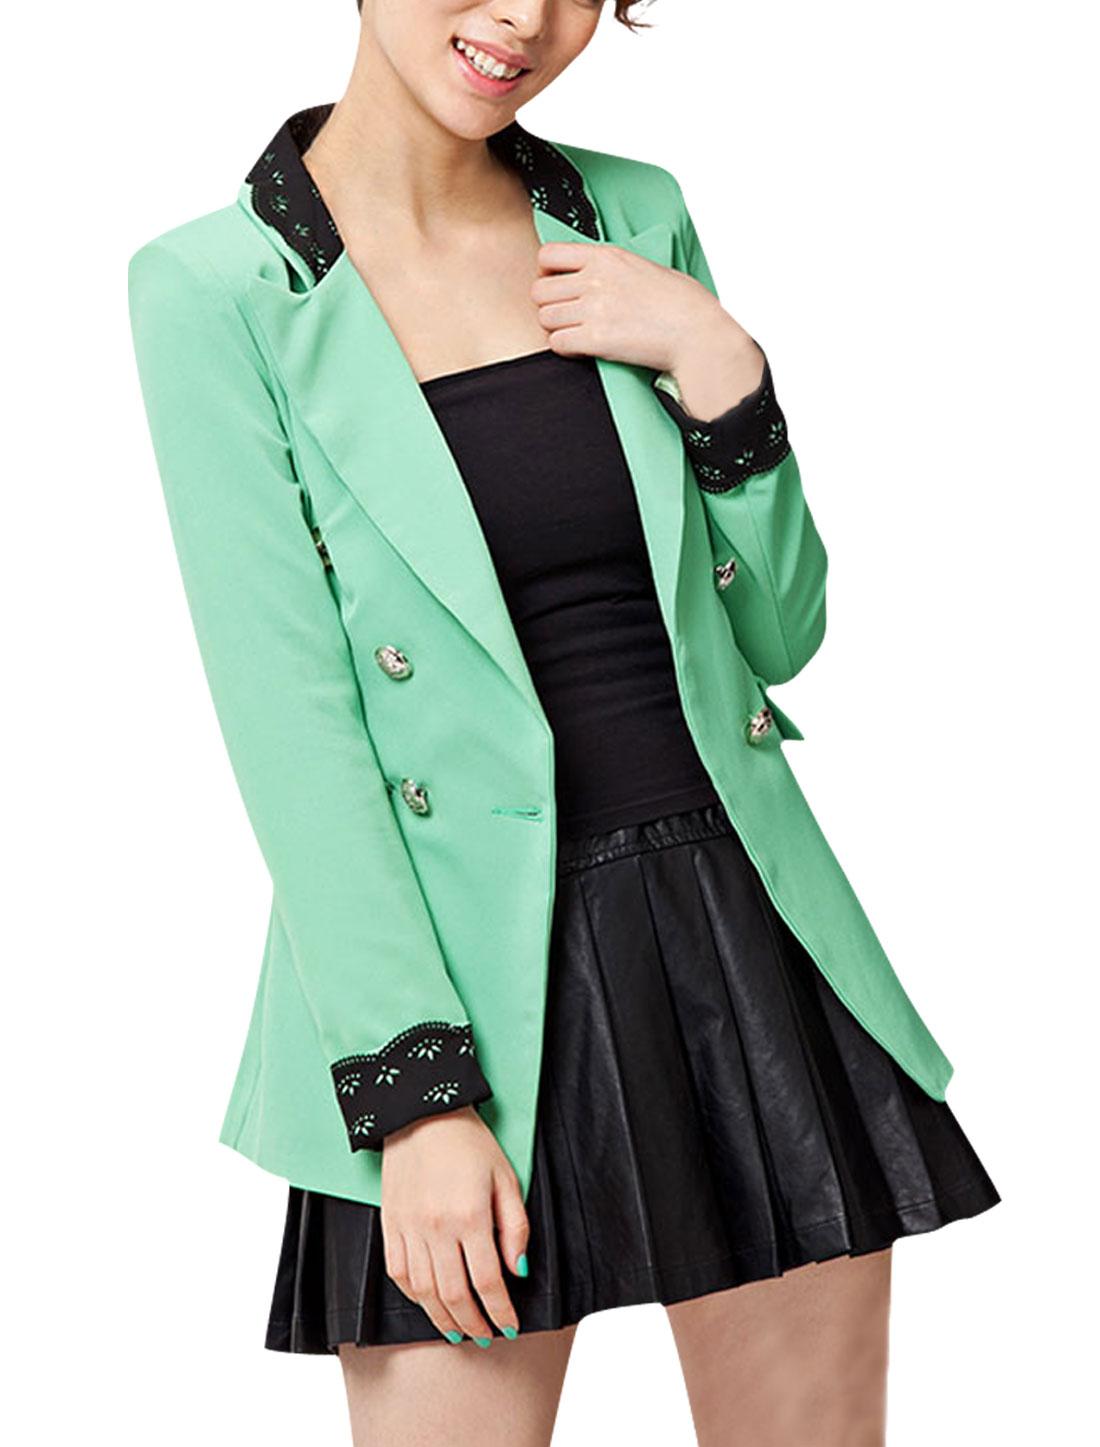 Women Peaked Lapel Double Breasted Slim Fit Blazer Coat Green S